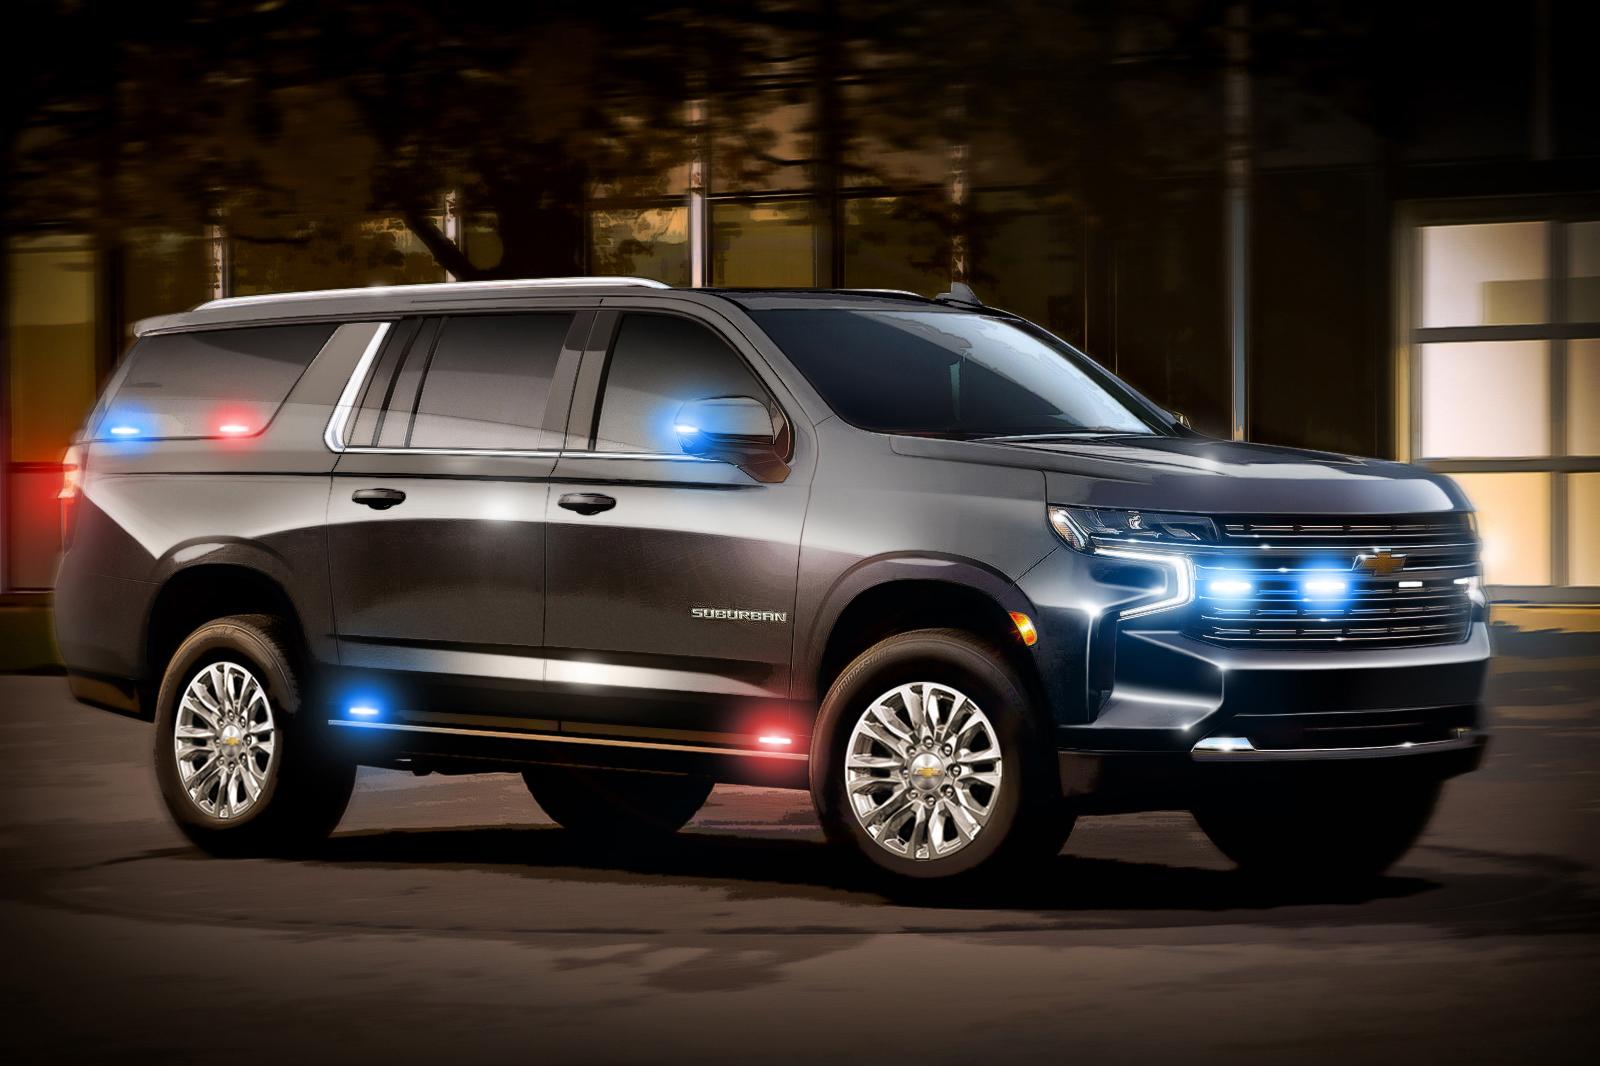 General Motors Chevrolet Suburban HD